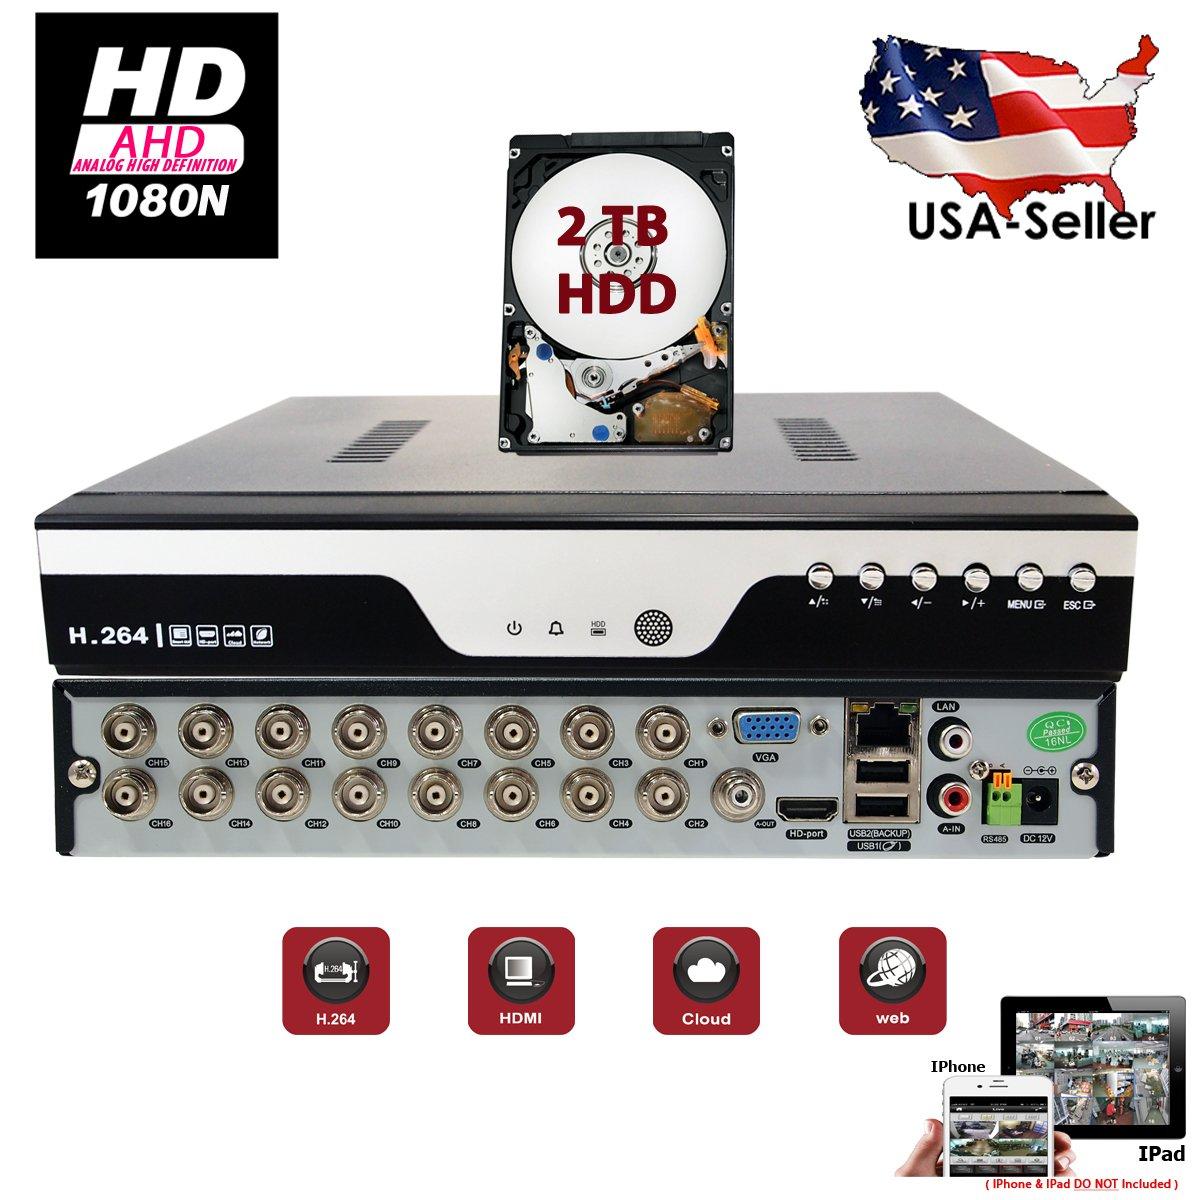 Evertech 16 Channel HD 1080N AHD Analog High Definition DVR HDMI Cloud + 2TB HDD Installed Security Surveillance System